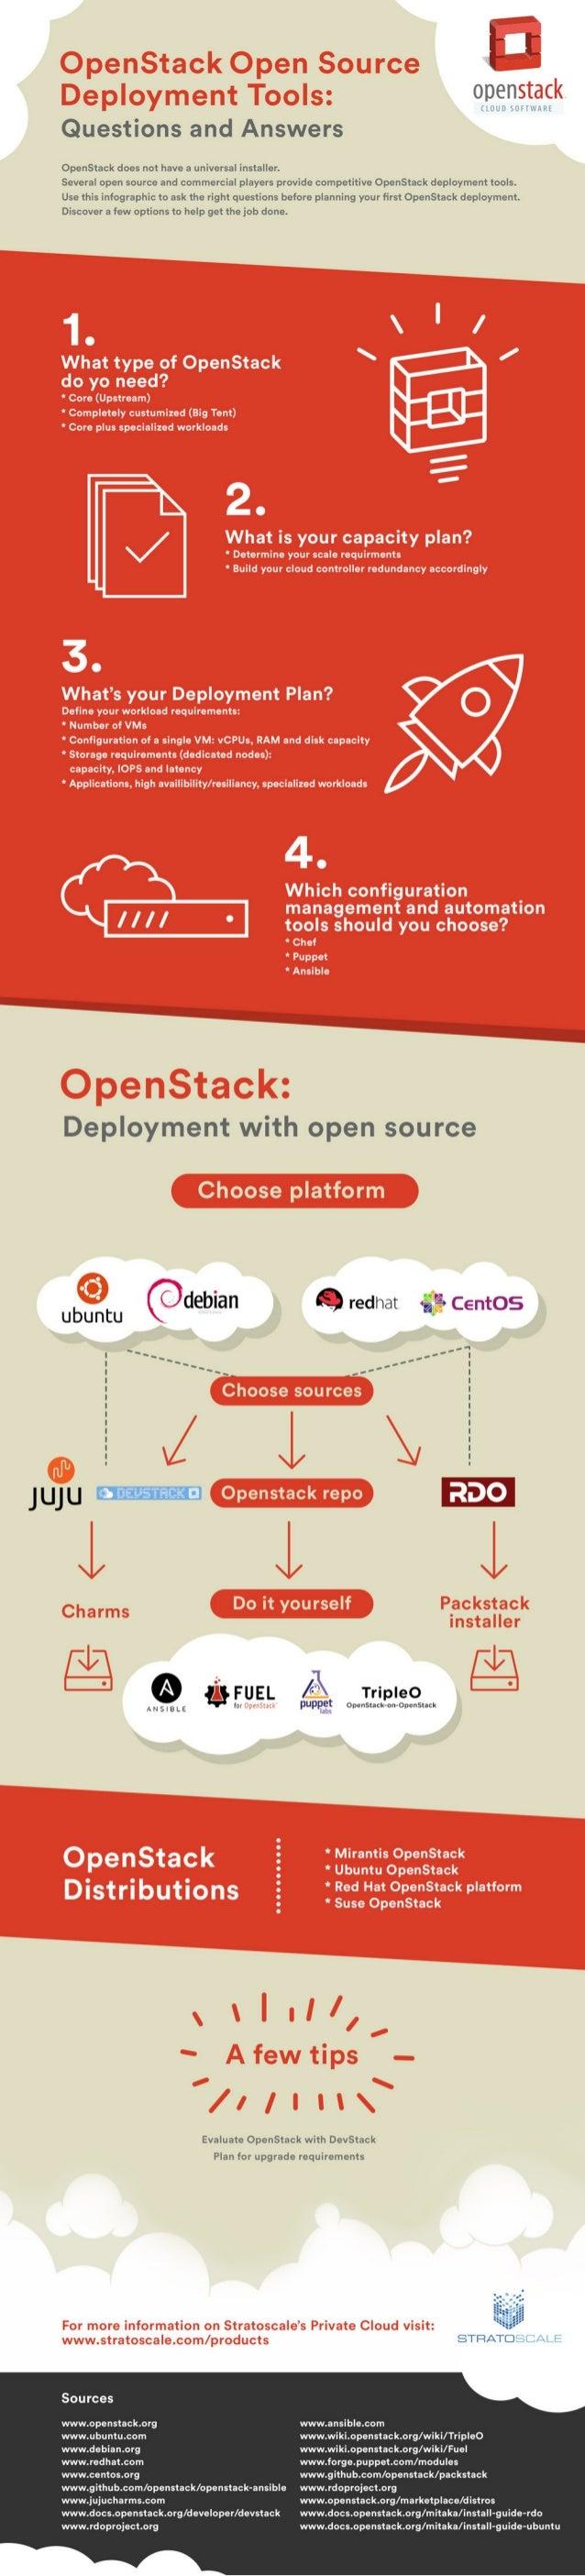 Infographic OpenStack - Deployment Tools